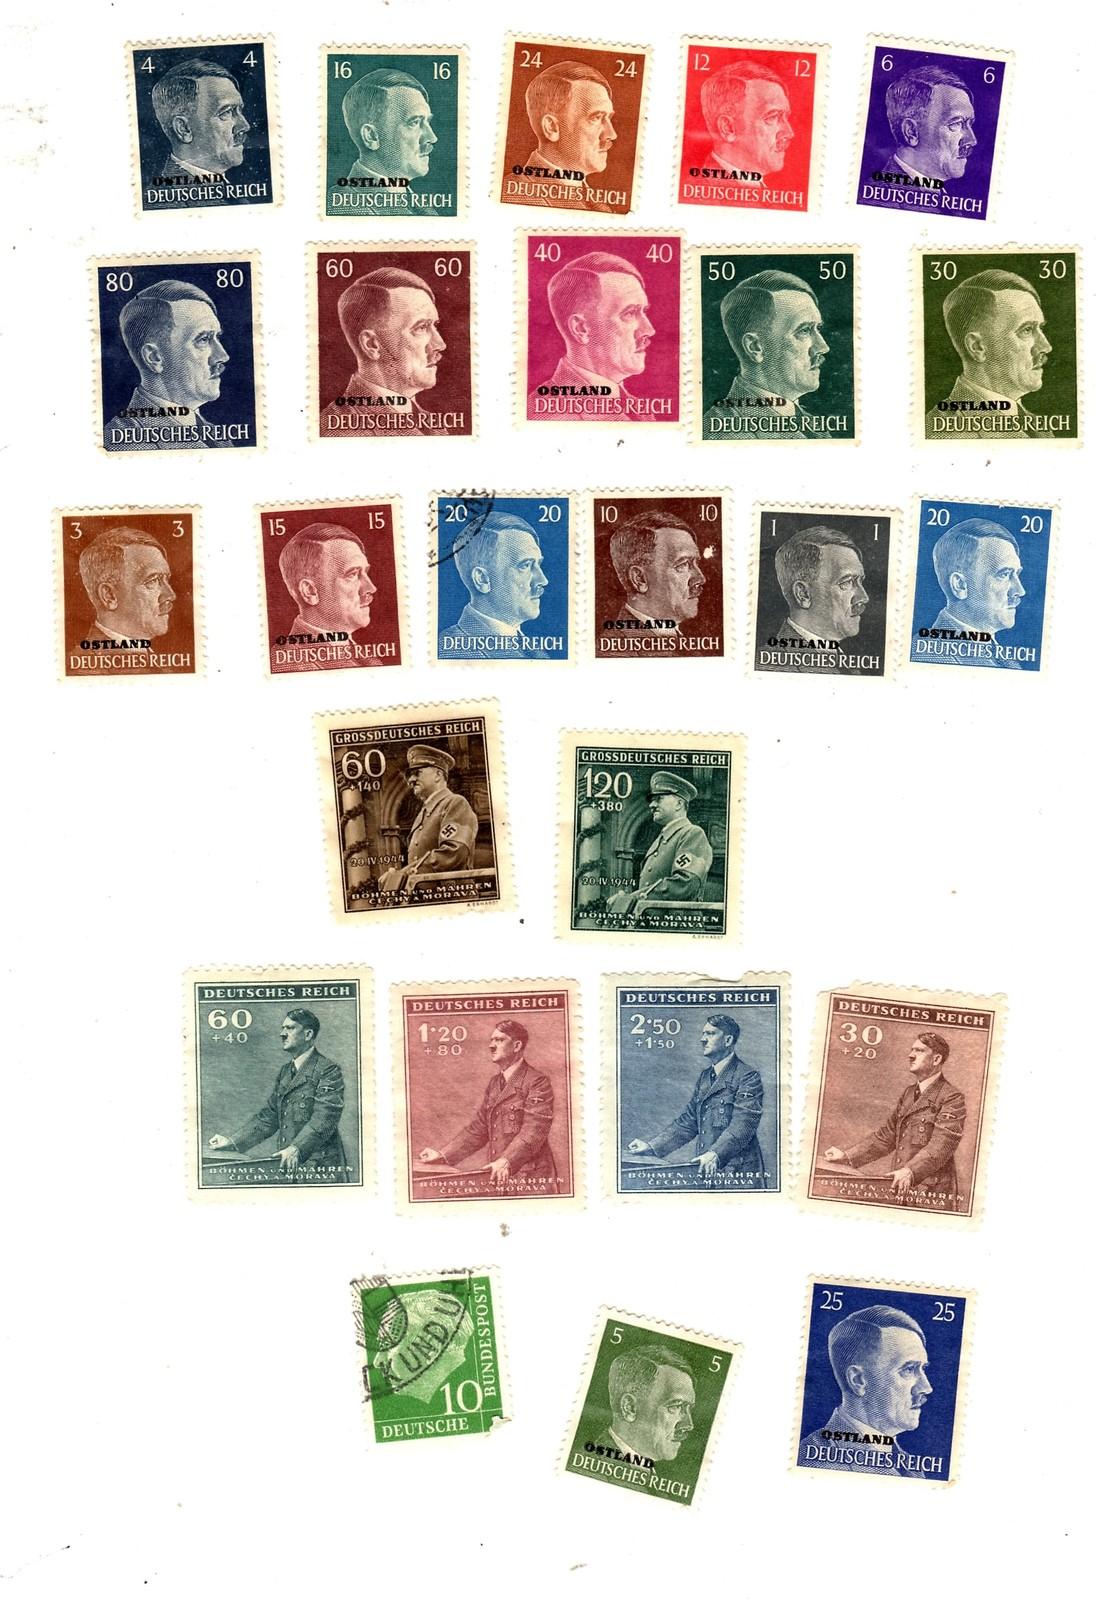 Stamps - Germany- European Postage -Germany (25 vintage stamps) image 2